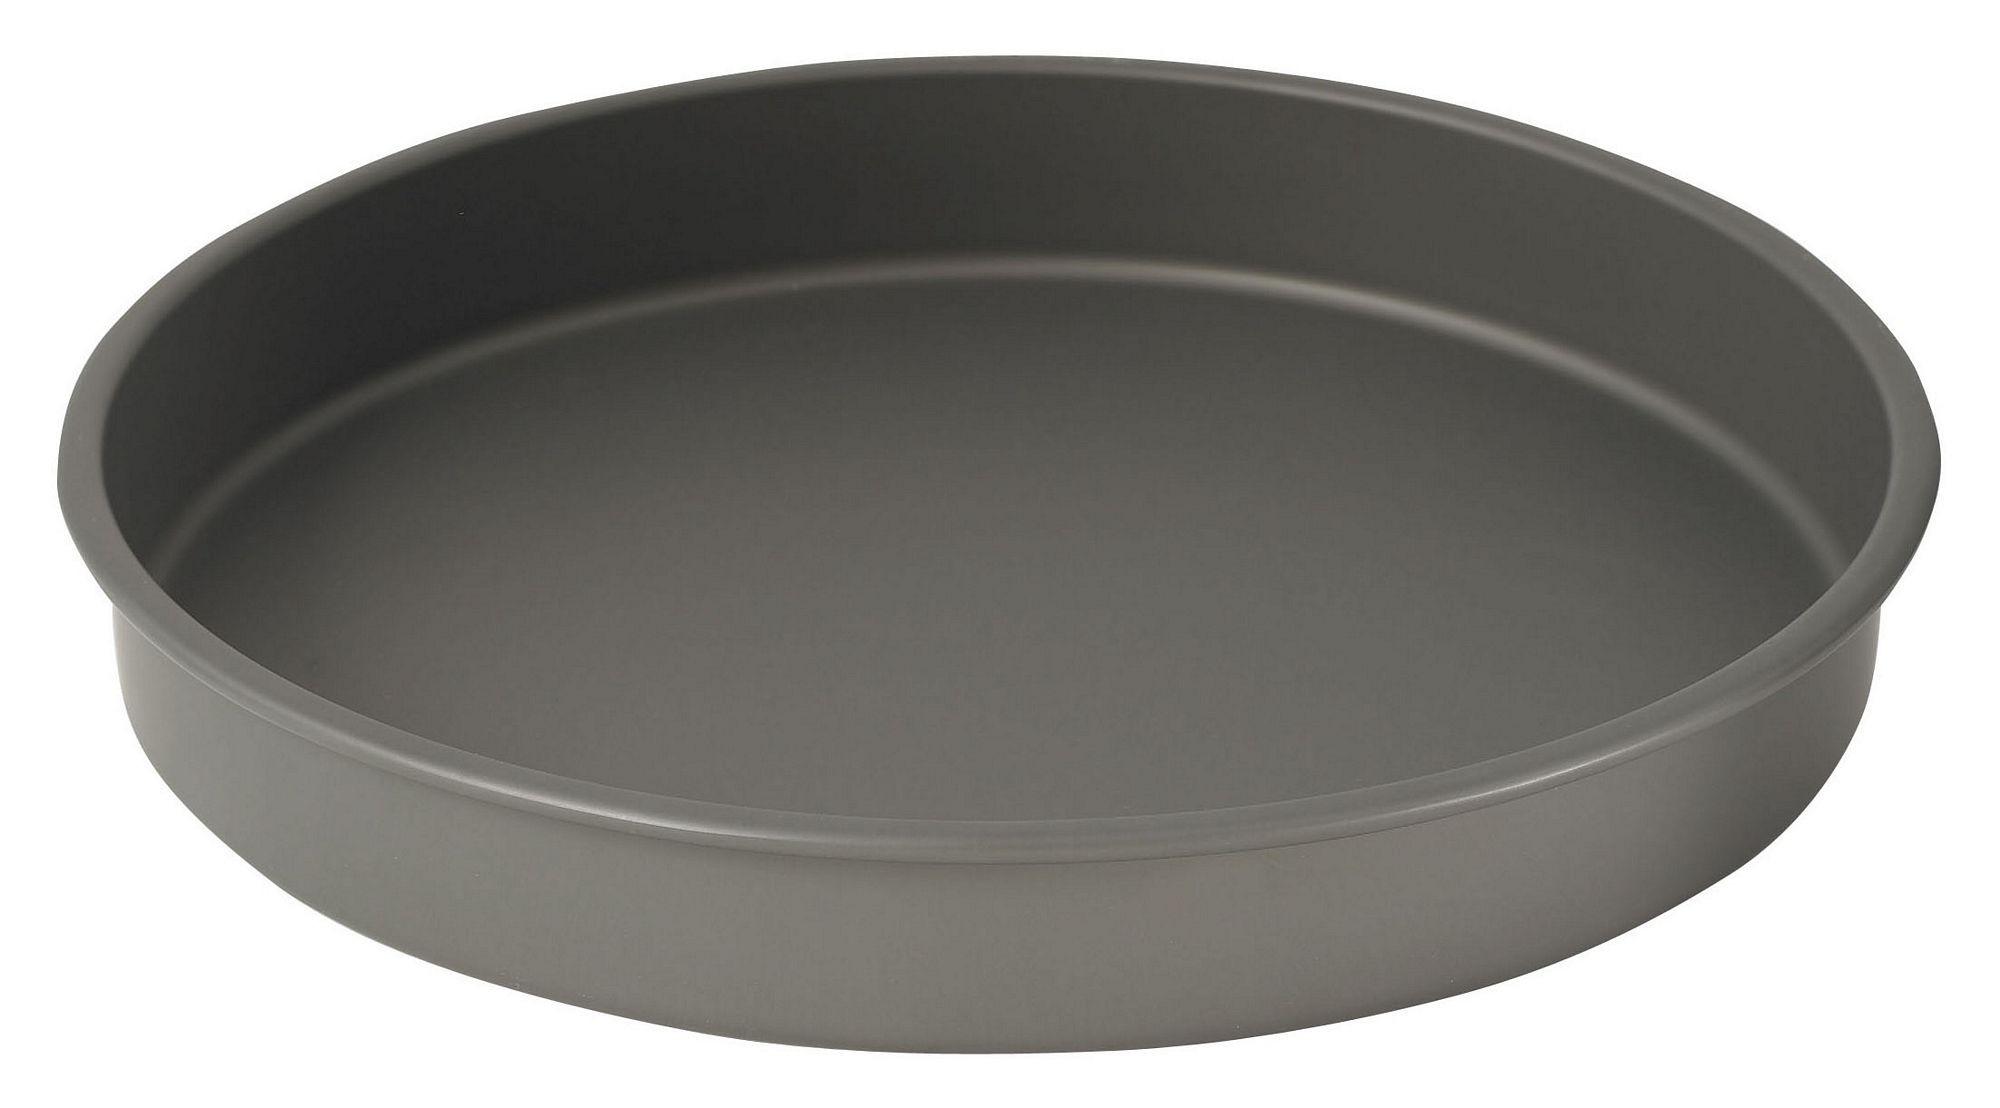 "Winco HAC-142 Hard Anodized Aluminum Cake Pan, 14"" Dia x 2"" H"